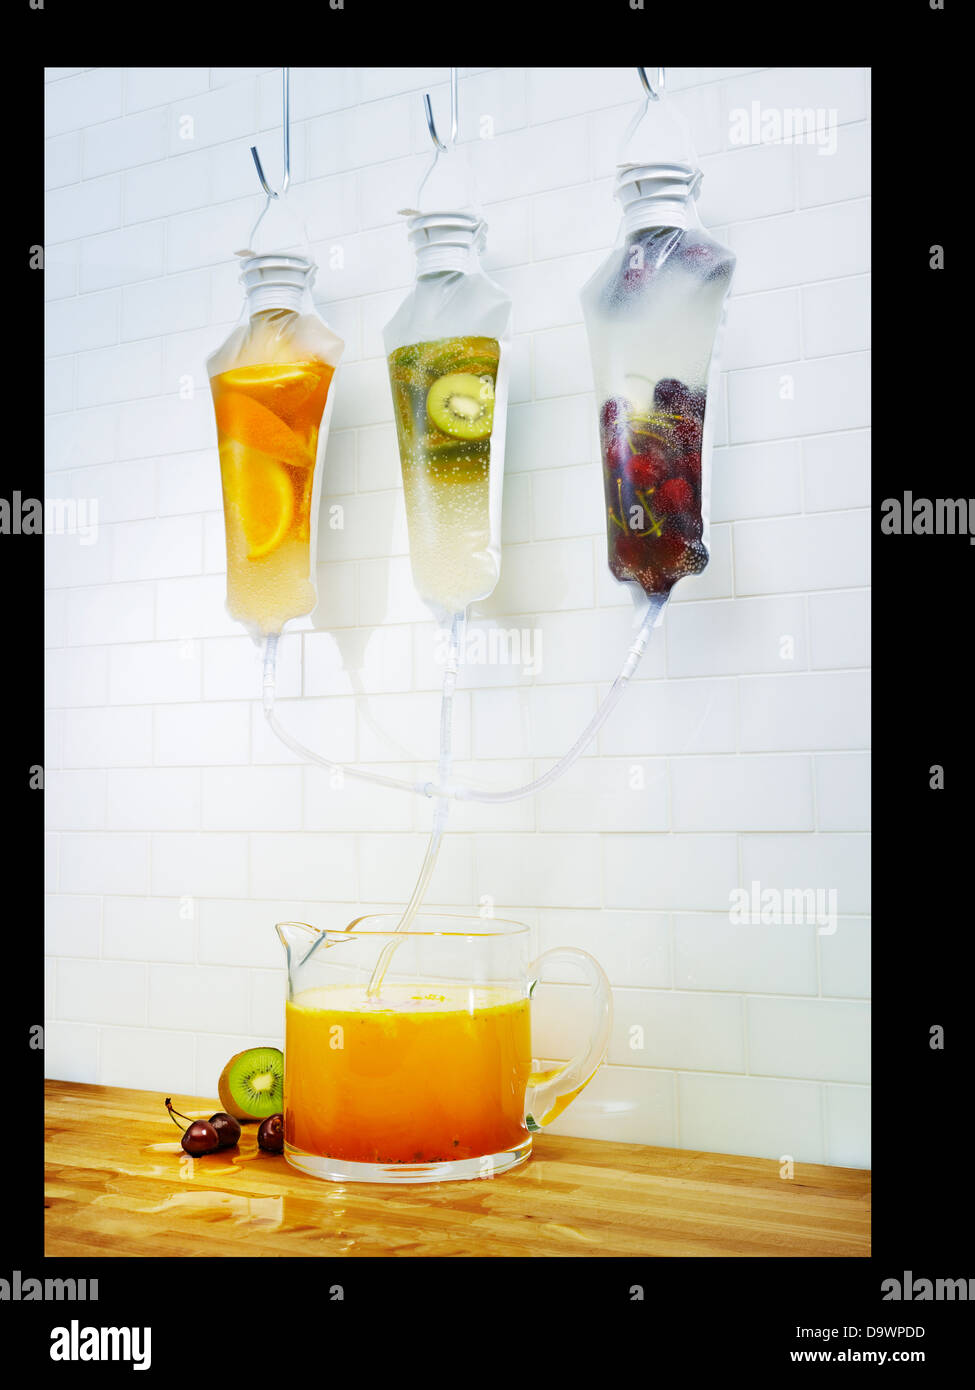 aqua fresca - Stock Image